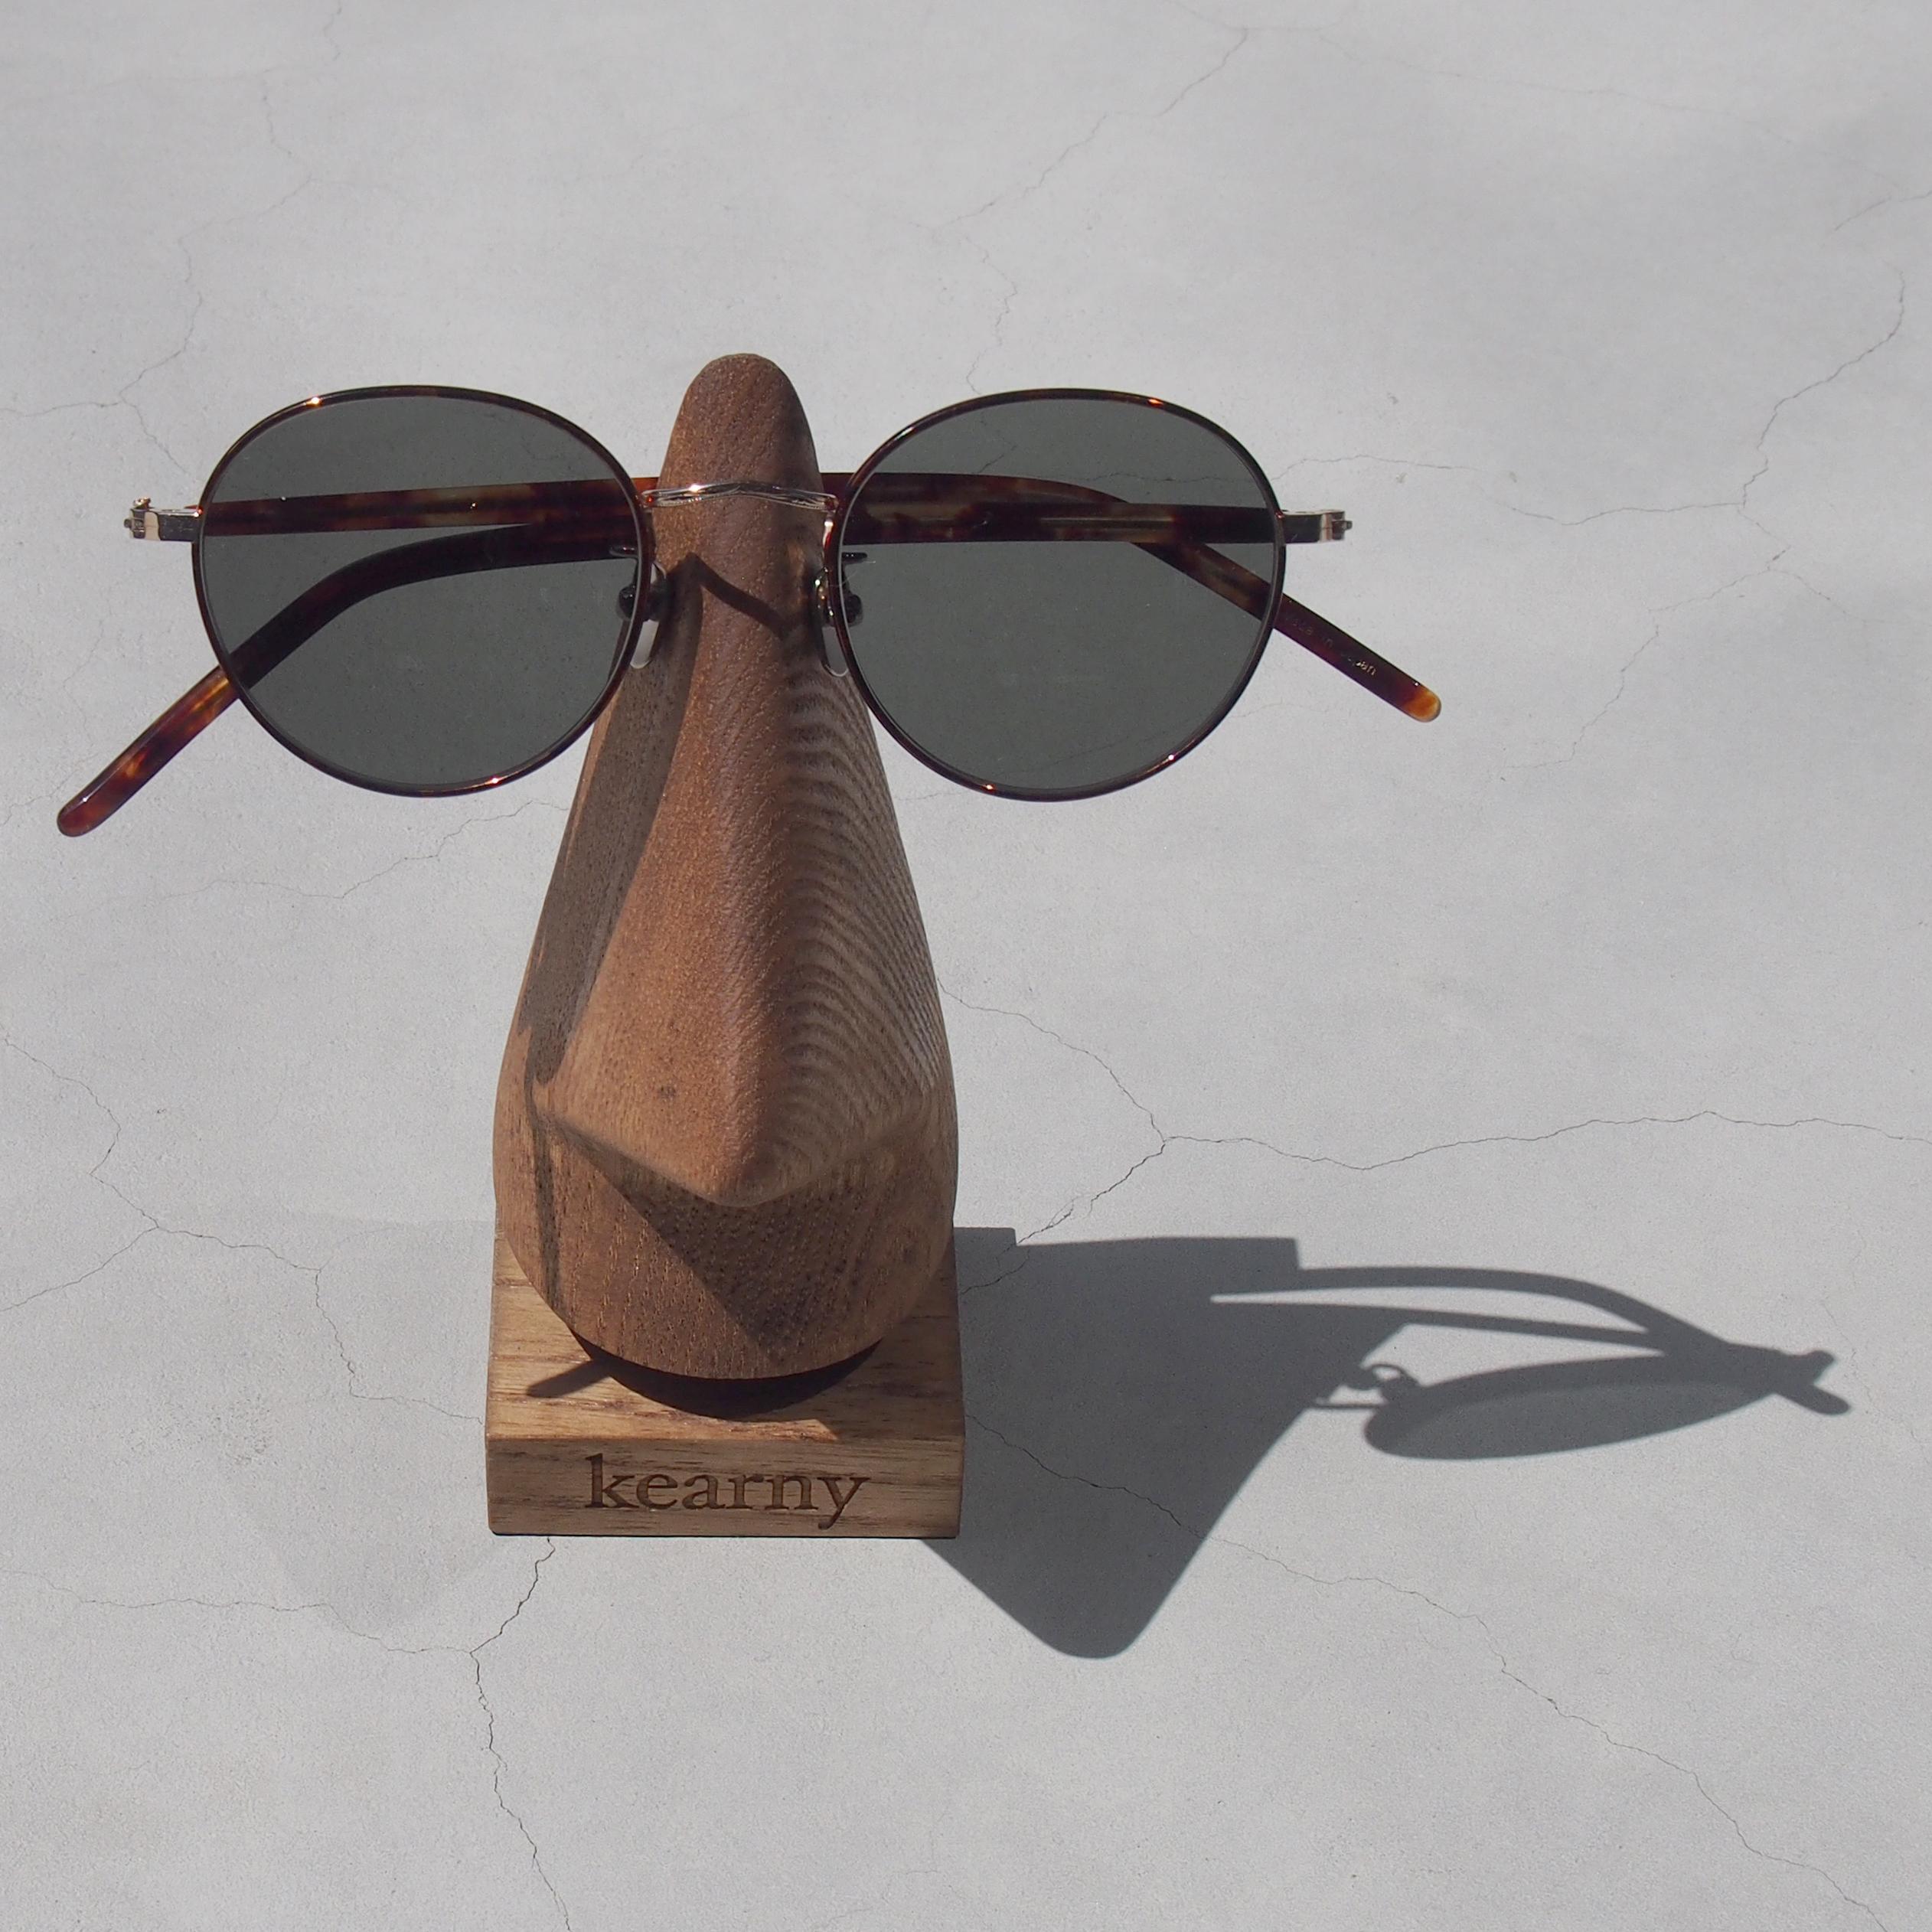 Kearny Soft frame 鼈甲 (sunglasses)